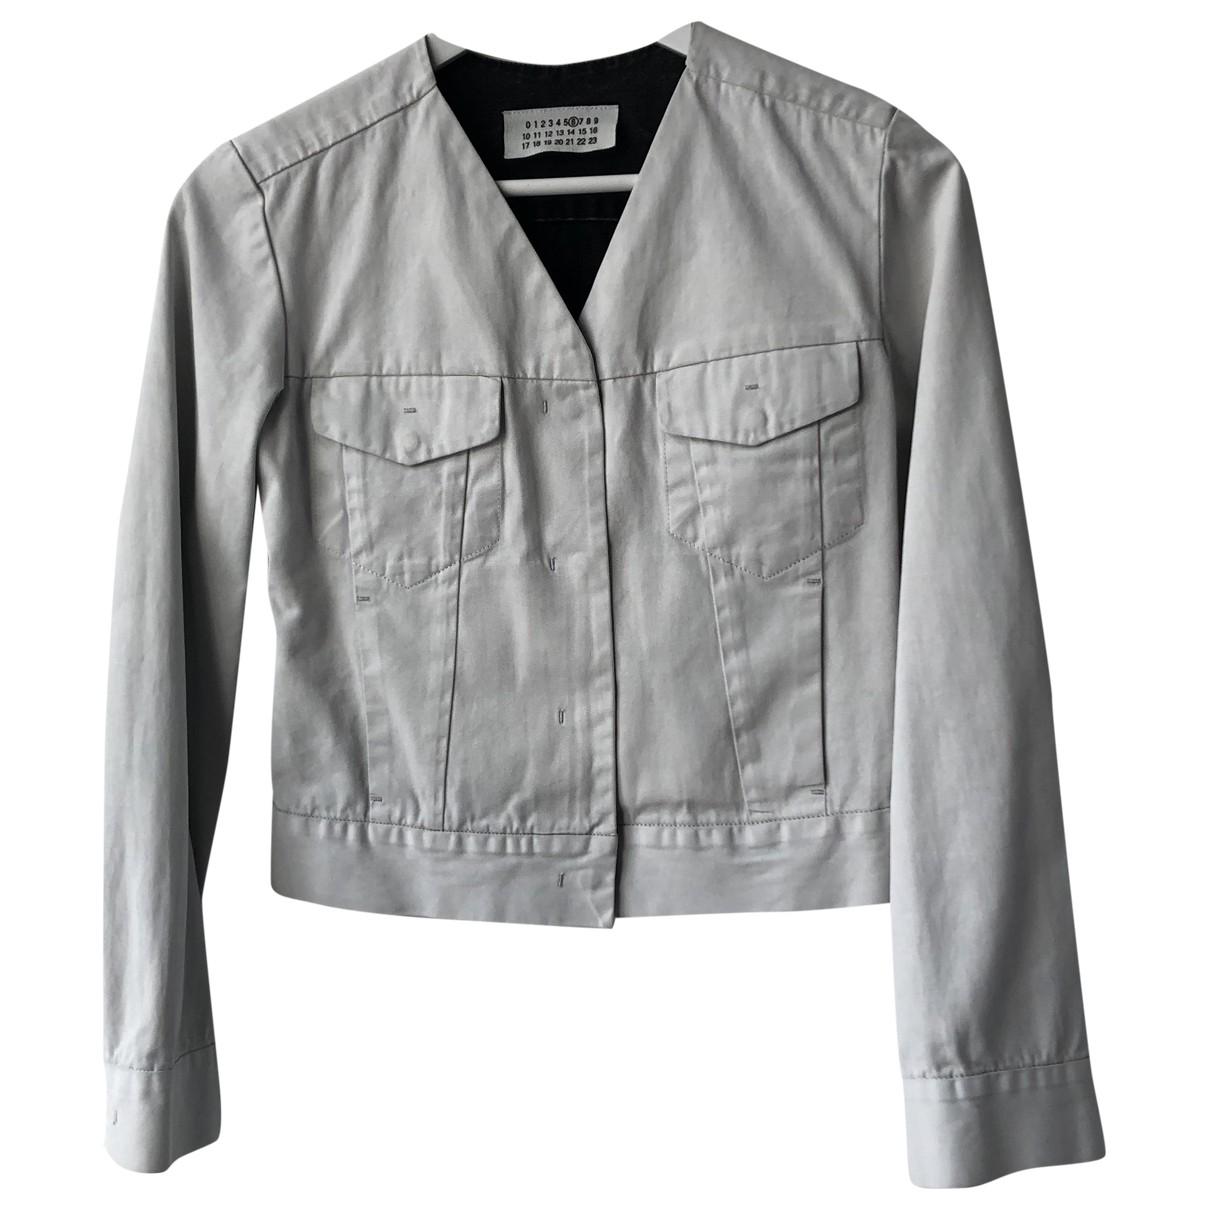 Maison Martin Margiela \N White Cotton jacket for Women 38 IT